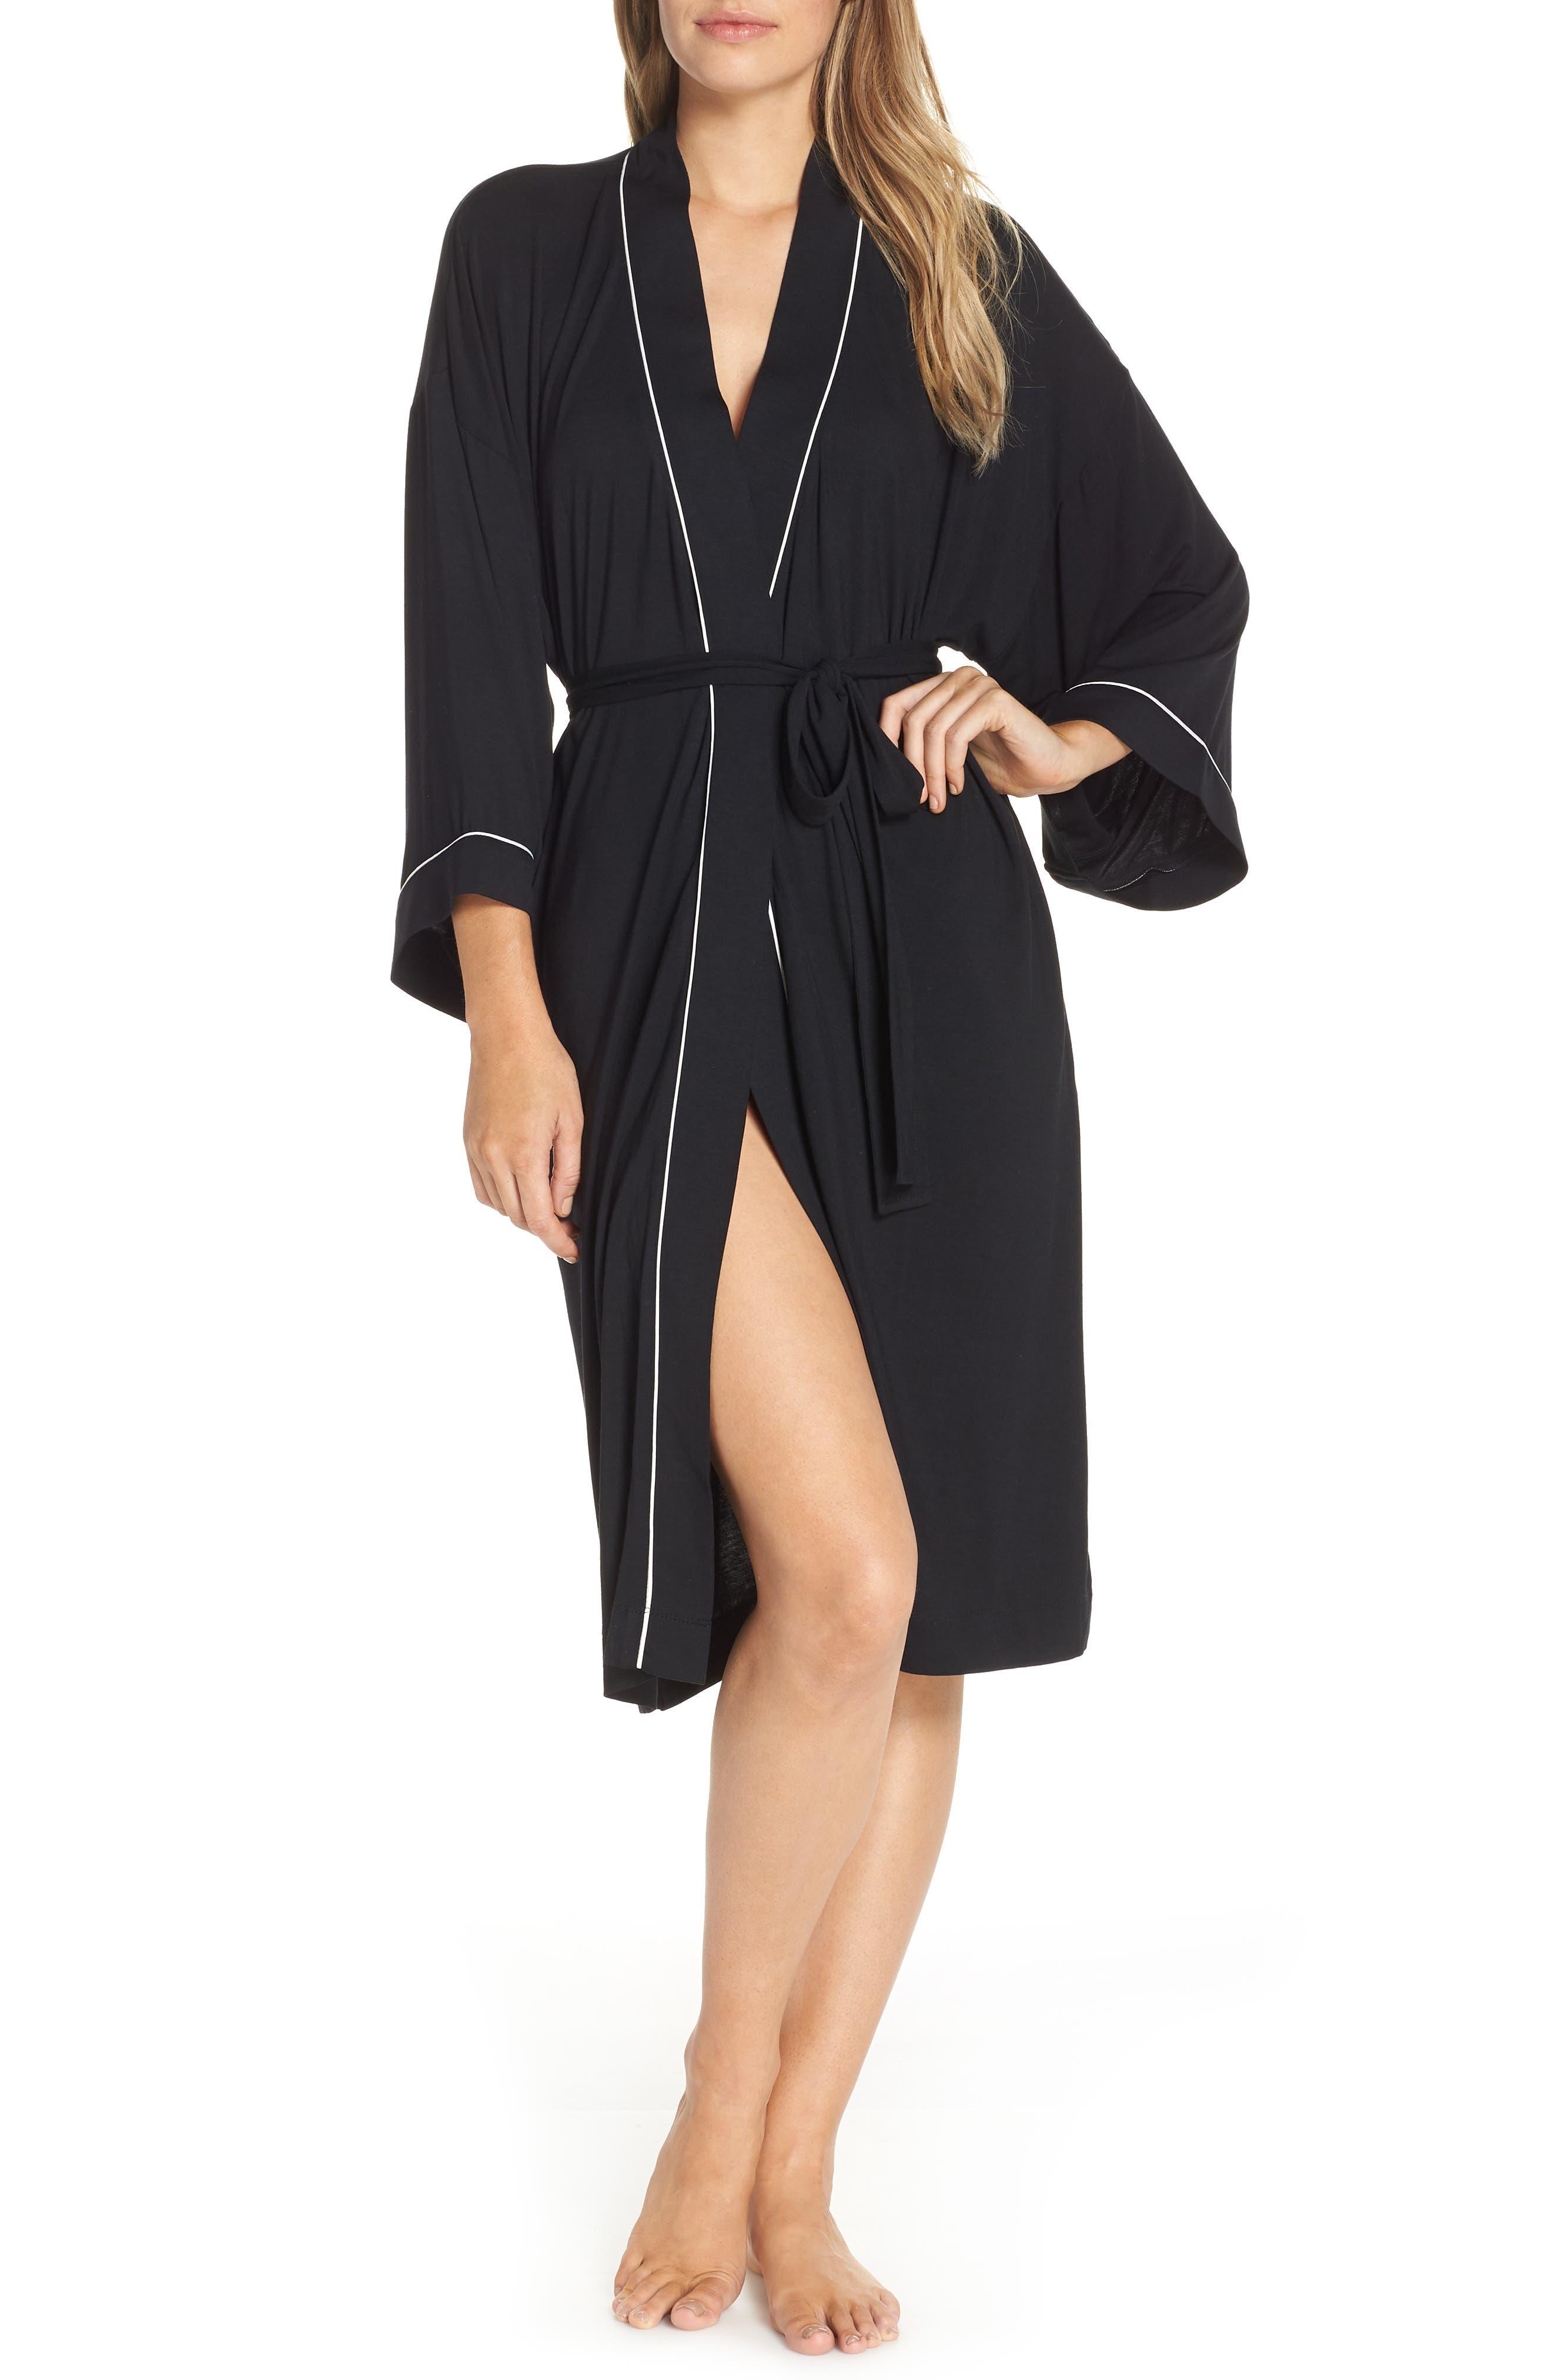 NORDSTROM LINGERIE, Moonlight Jersey Robe, Main thumbnail 1, color, 001